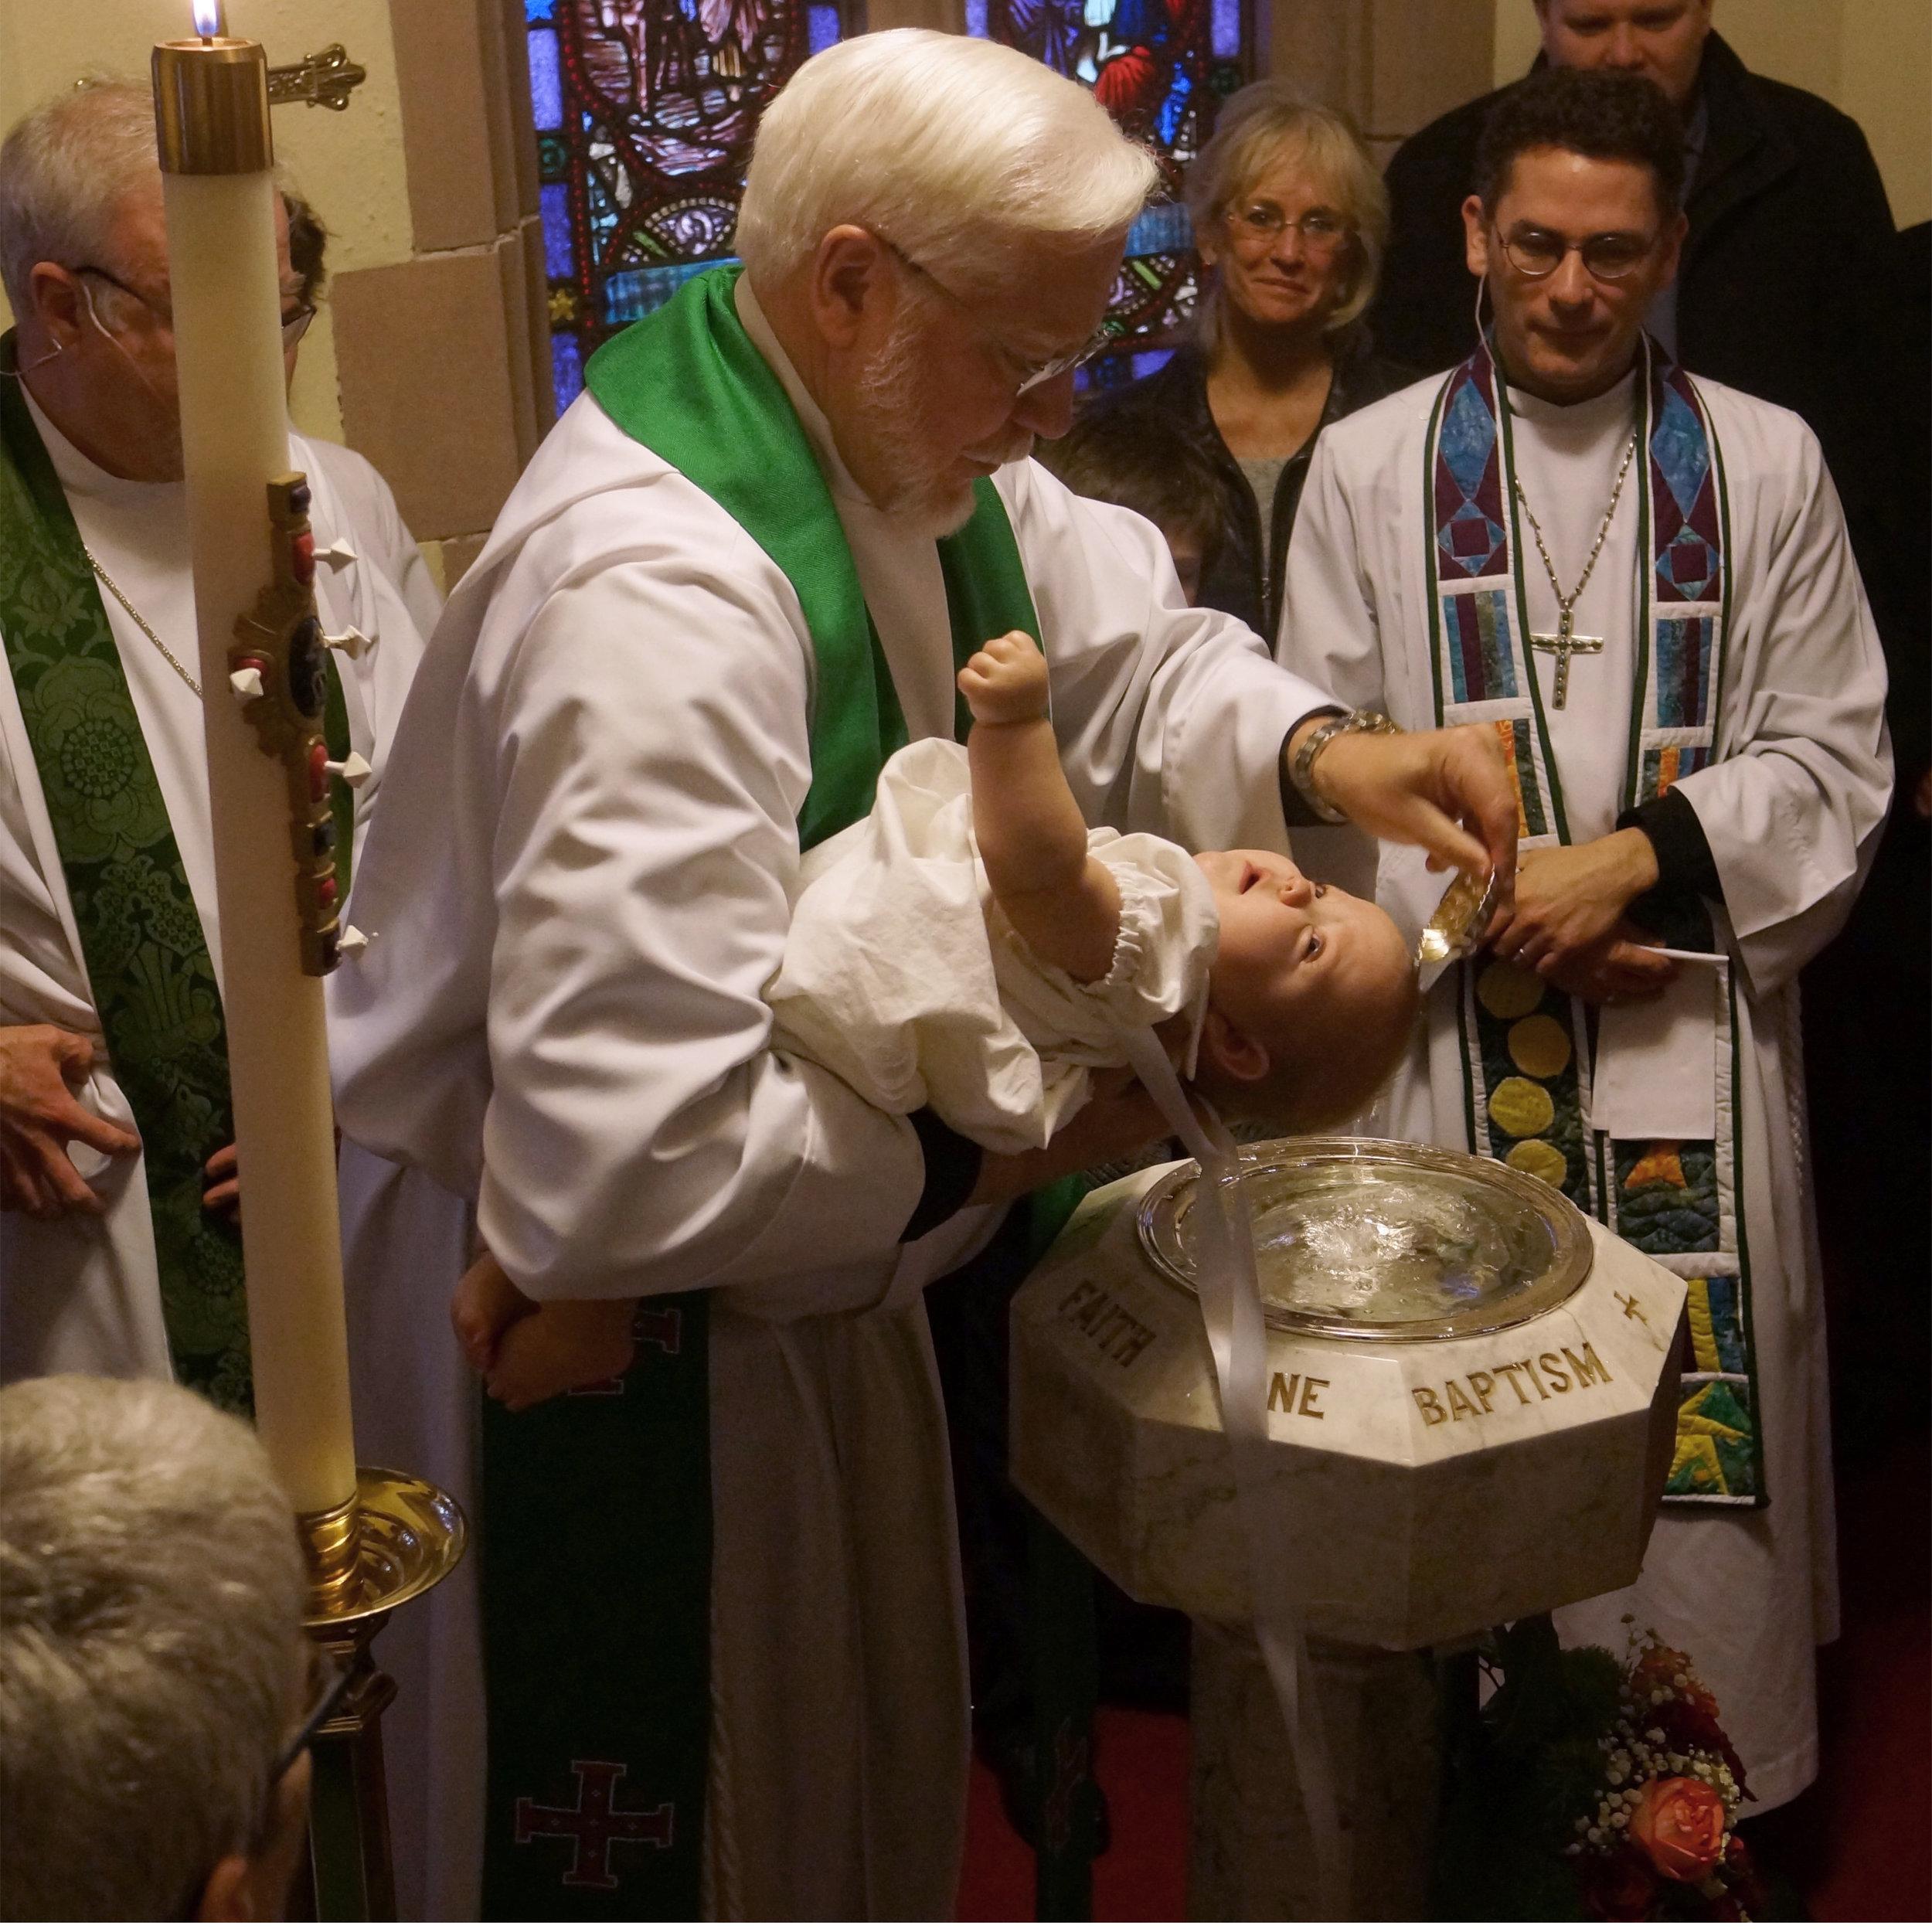 BaptismChuckSquare.jpg